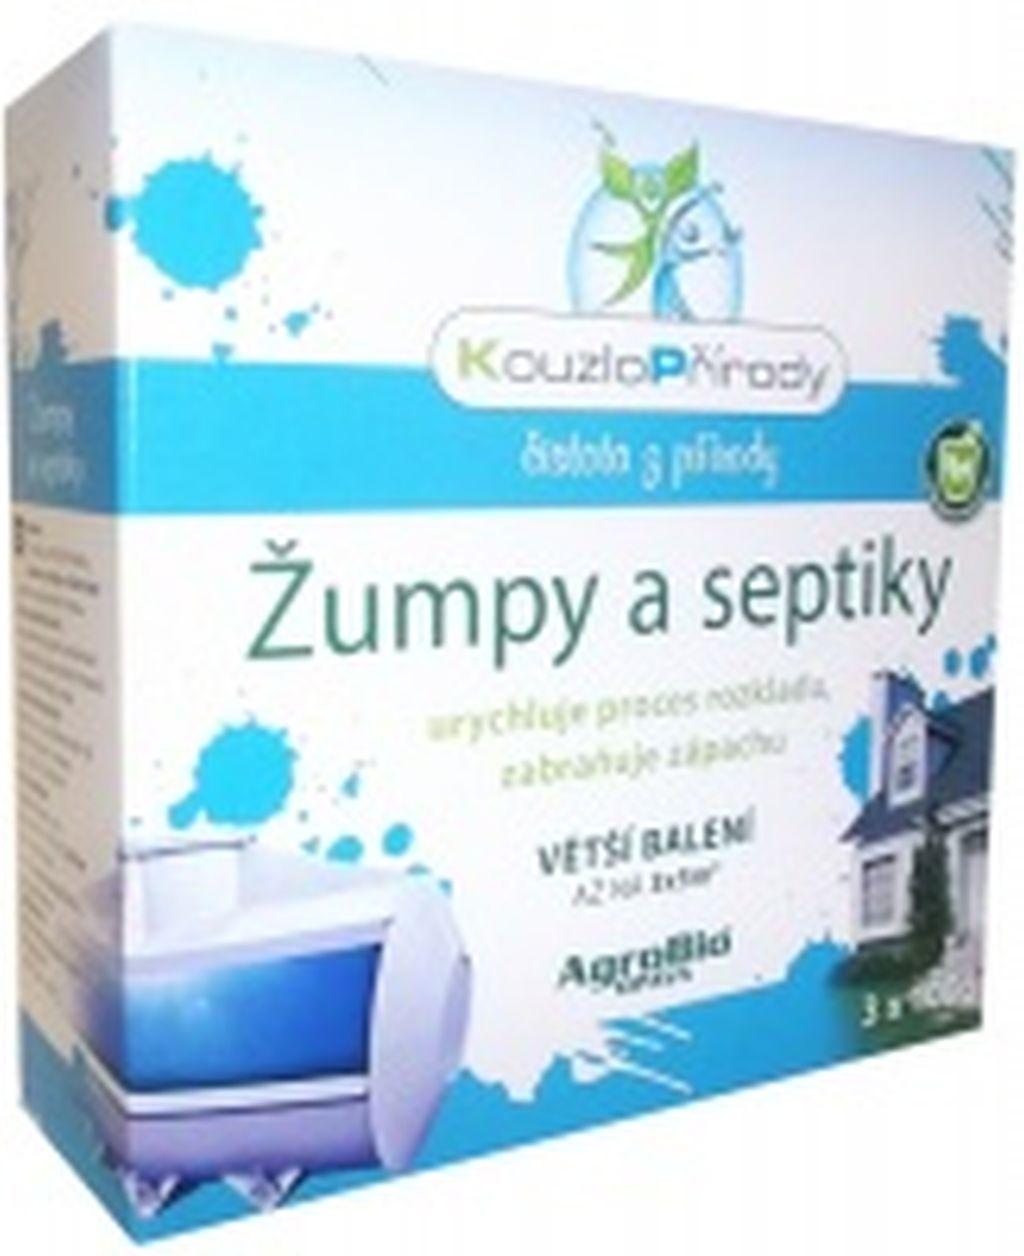 AgroBio KP Žumpy a septiky 3x100 g